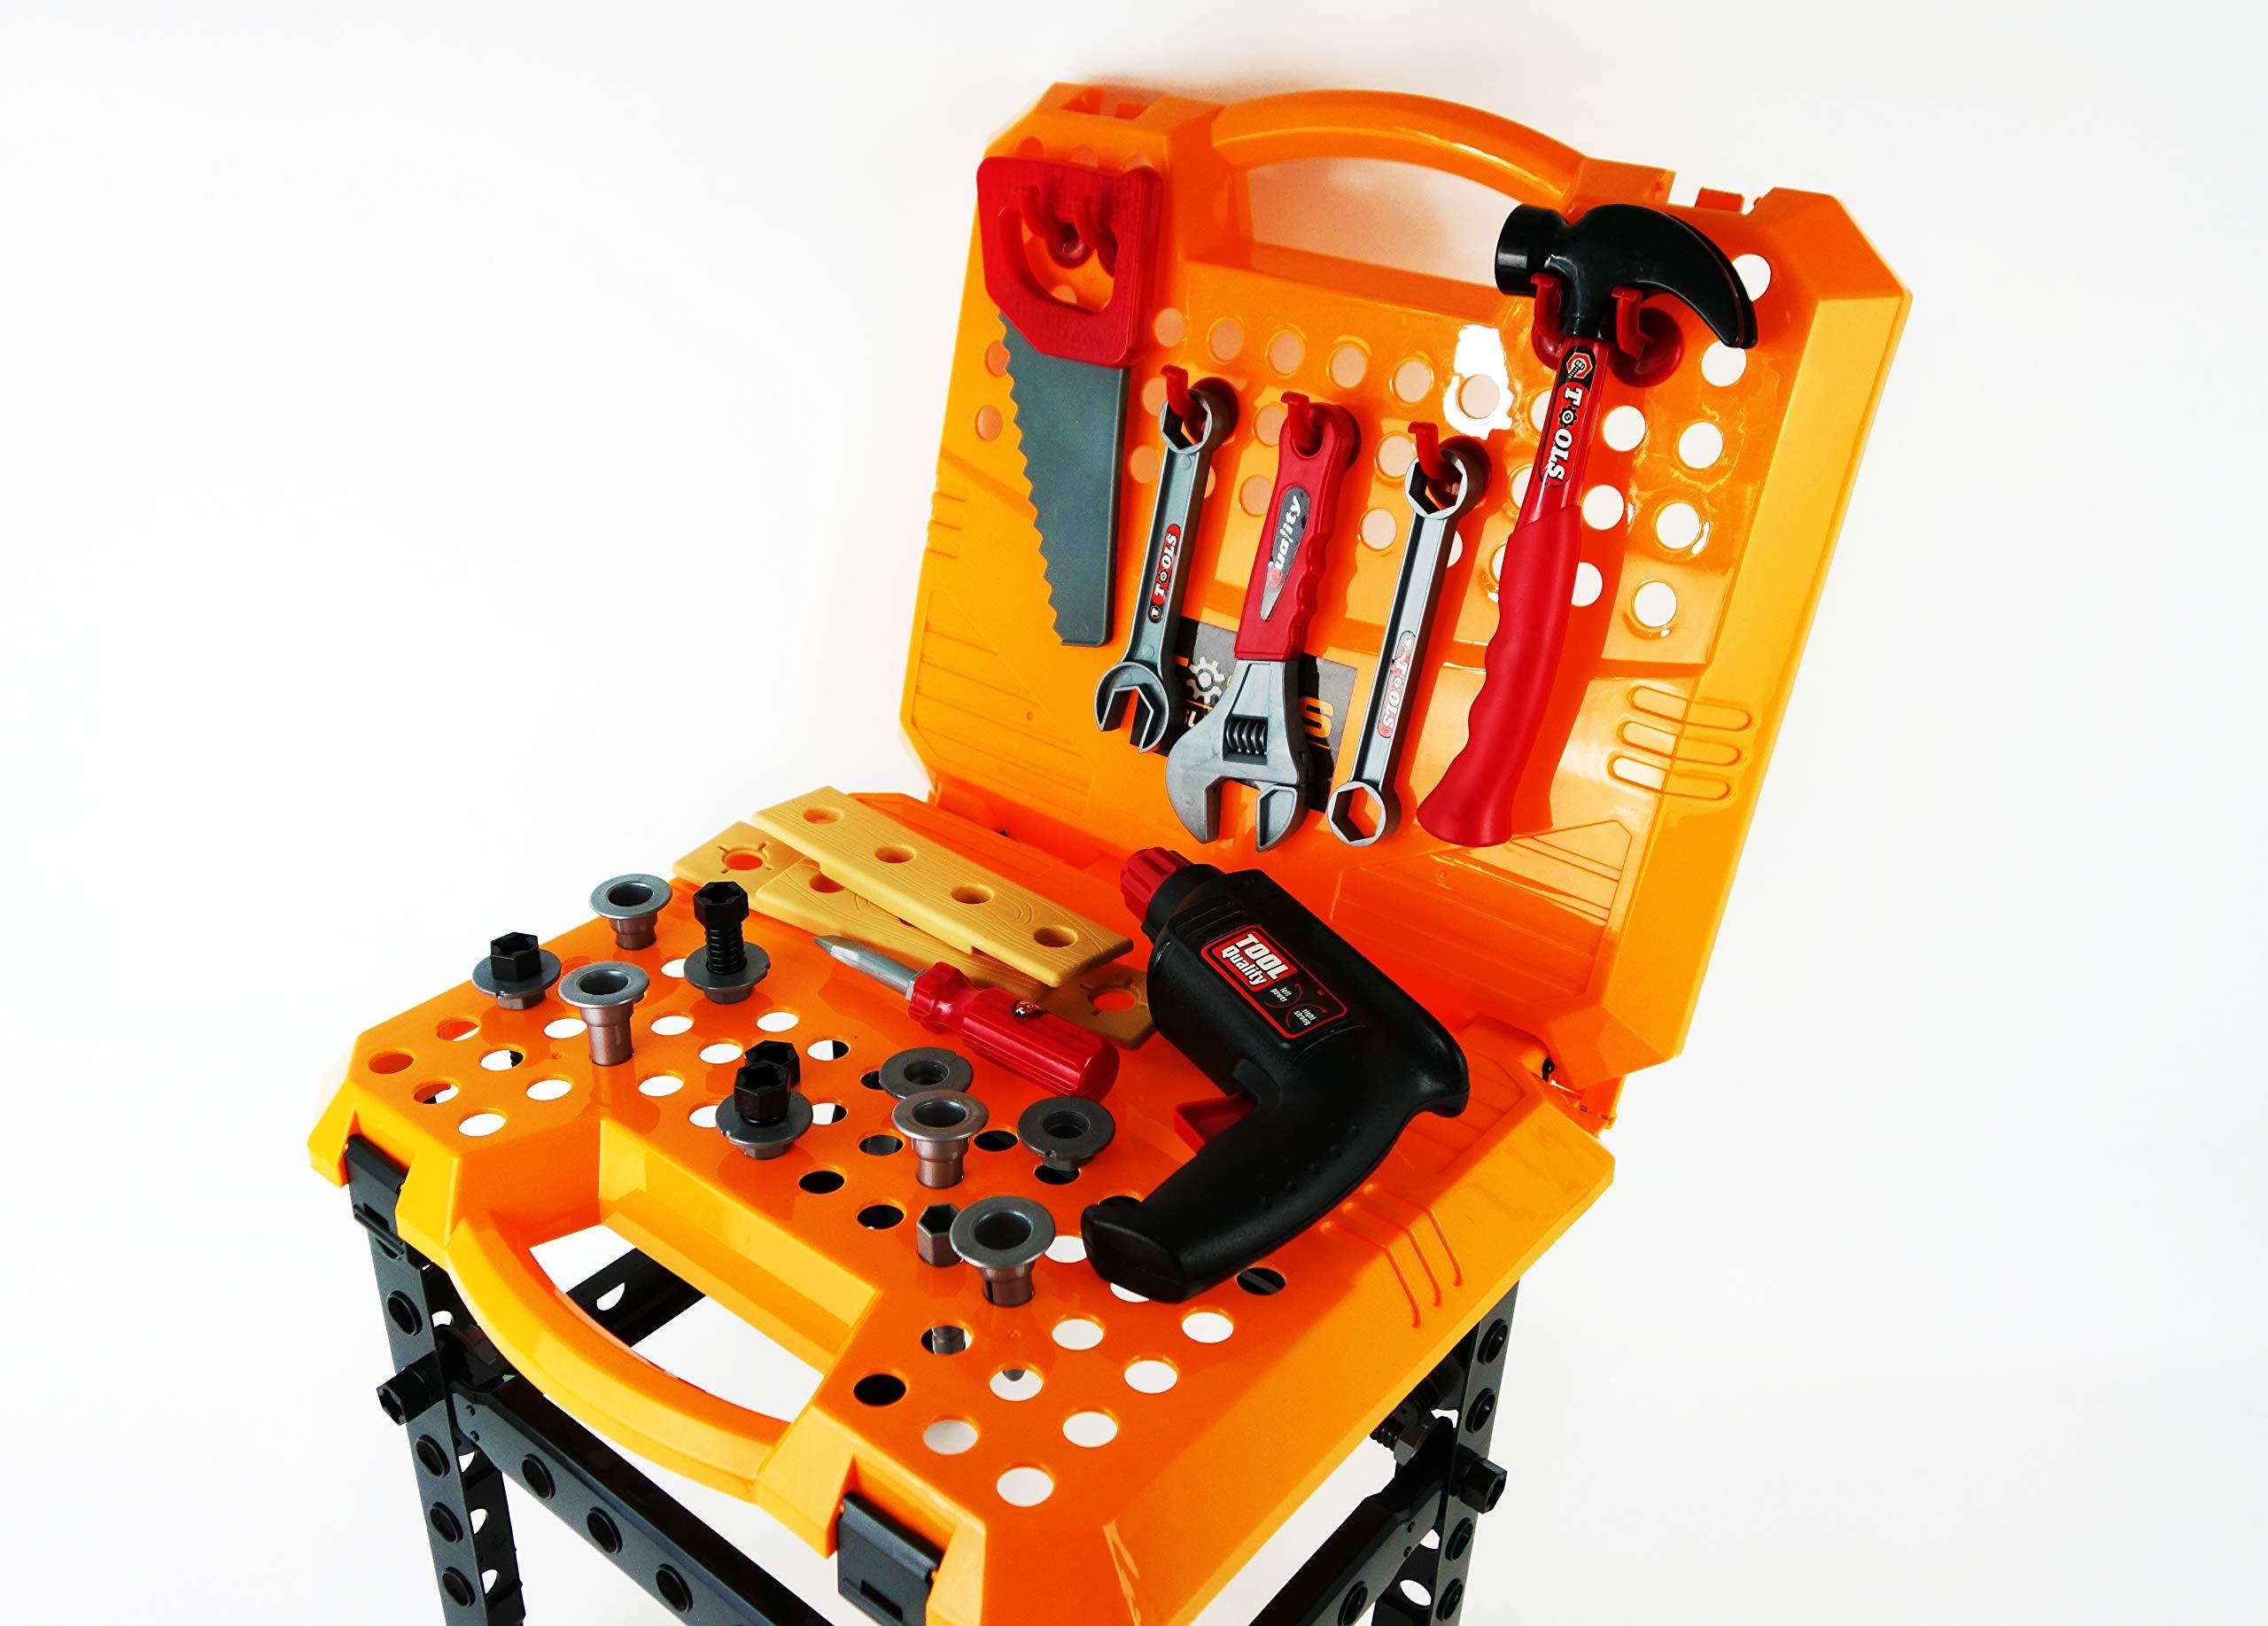 NBD Corp Kids Tool Box, Kids Handyman Tool Set with Stand